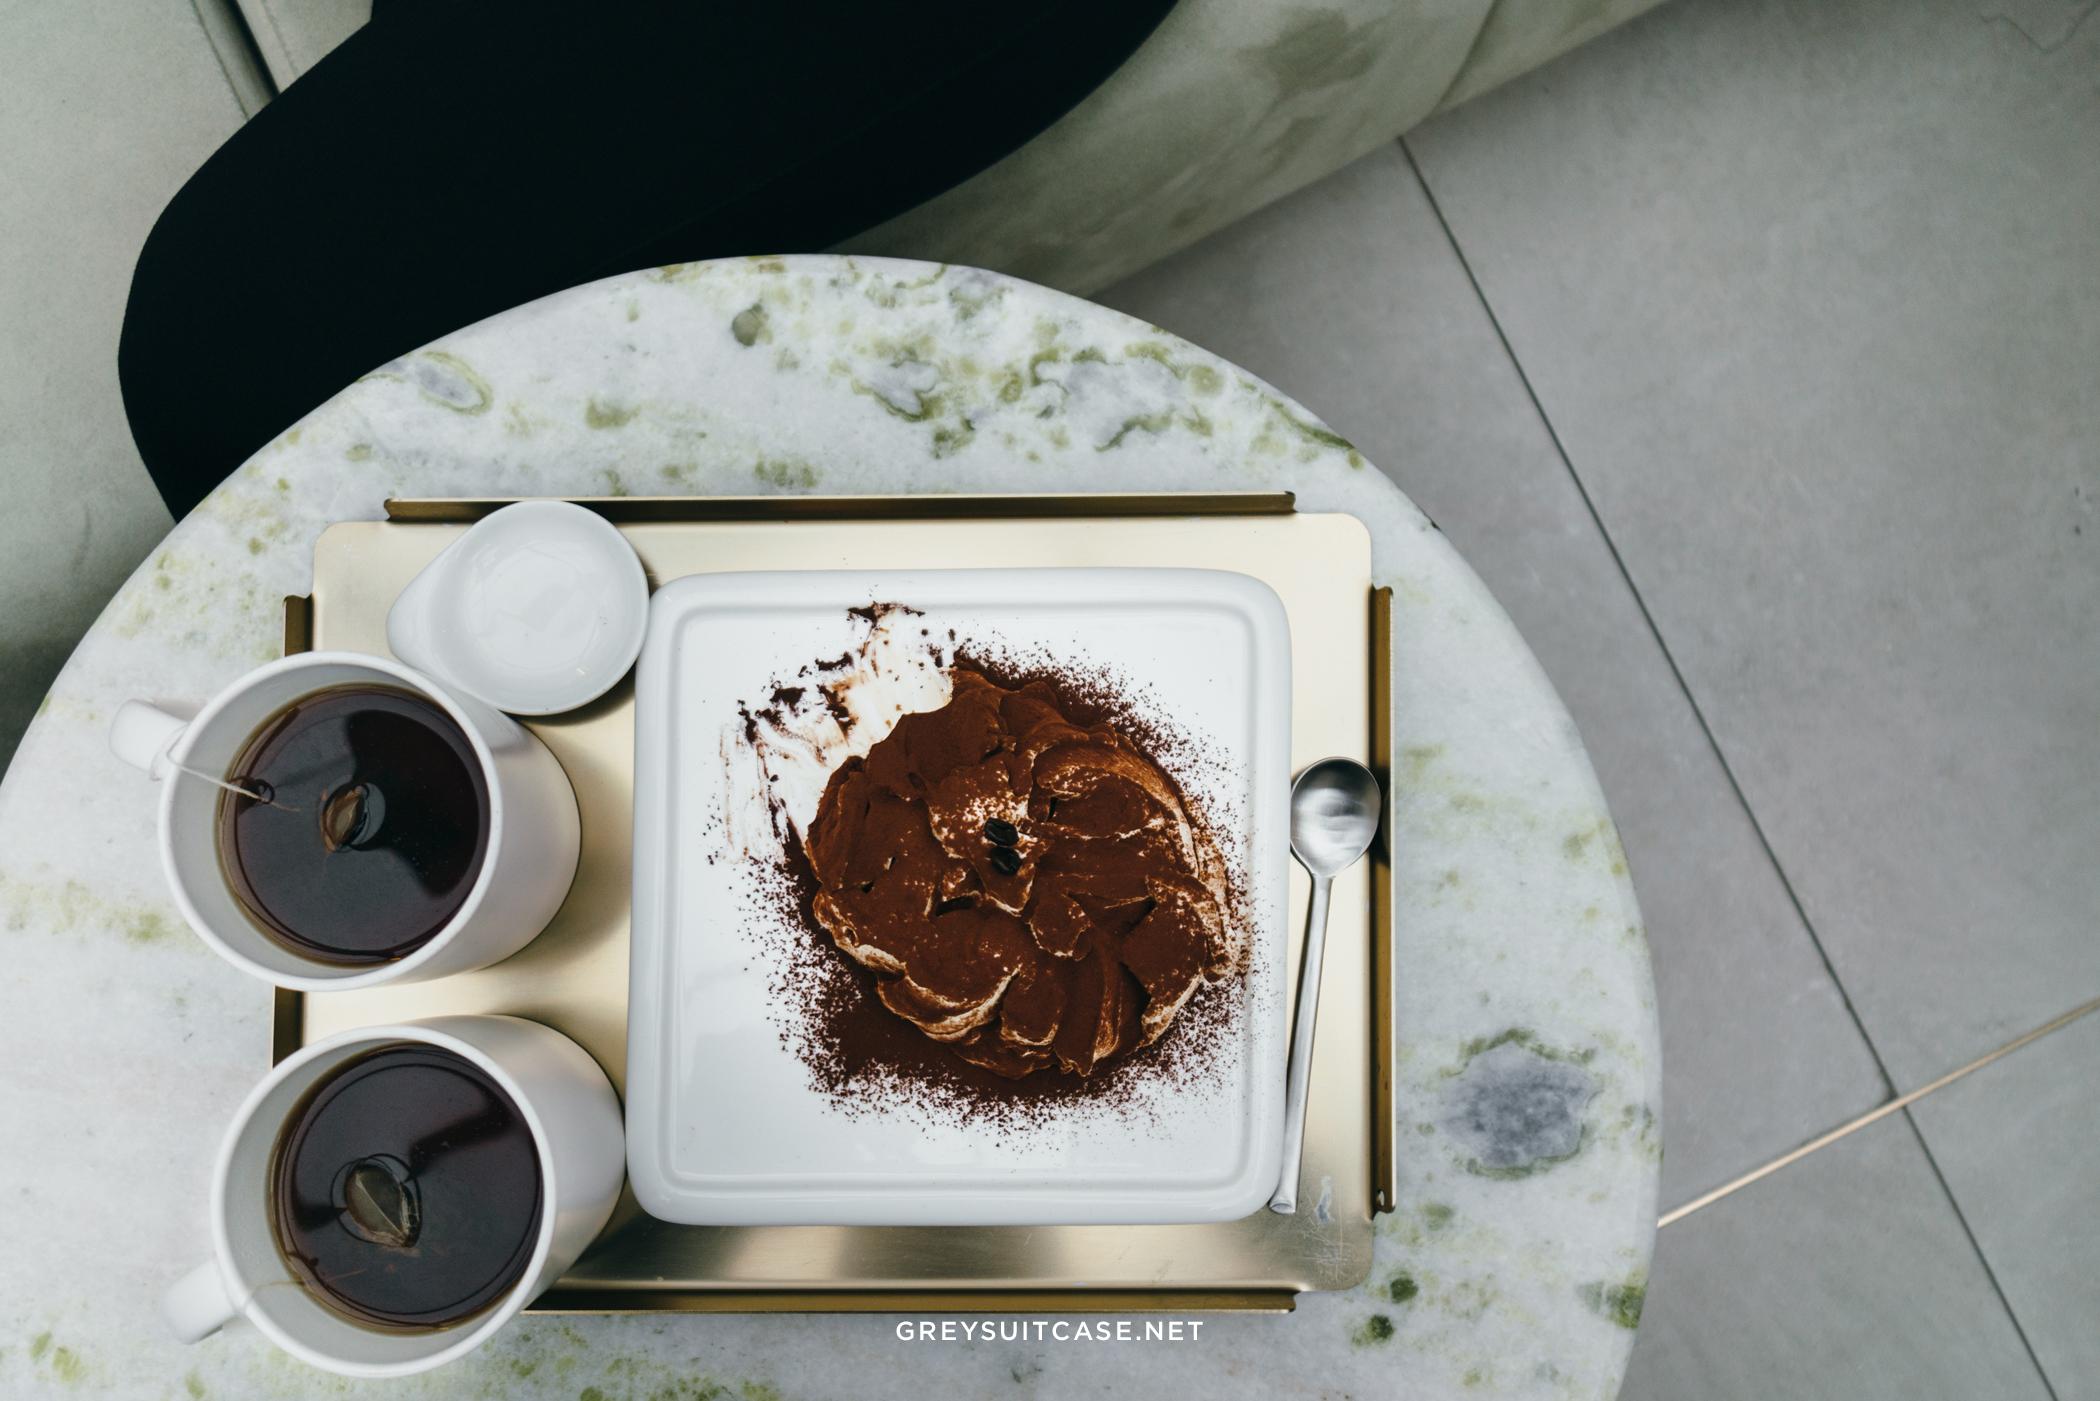 Greysuitcase Travel Series - Seoul Spring '17 - Cafe Mula 카페 뮬라, Garosugil, Seoul, South Korea